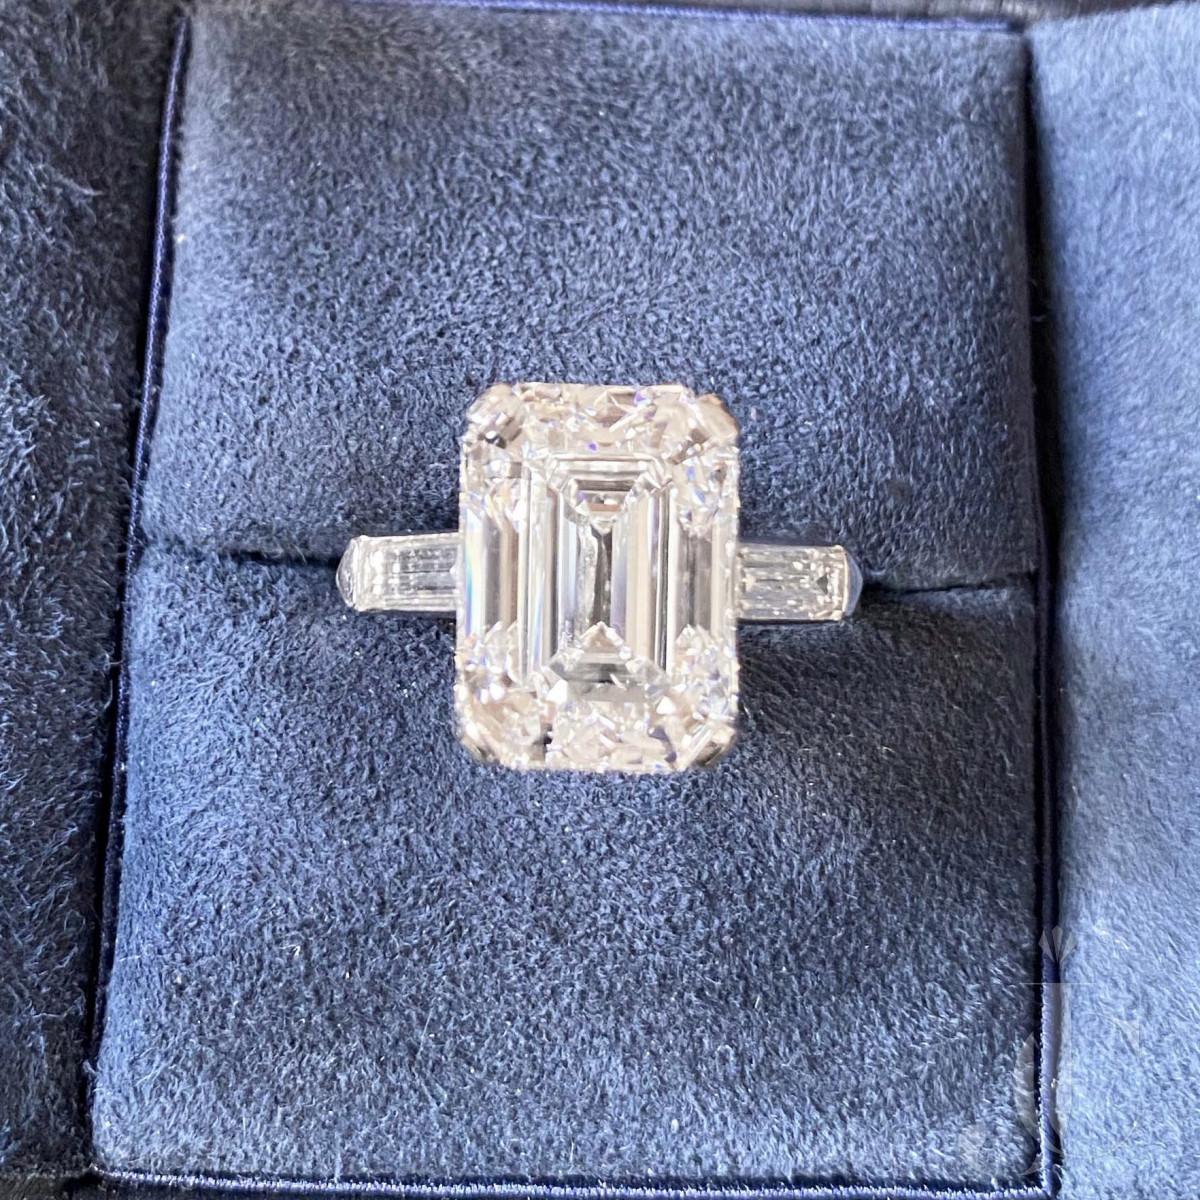 Platinum 7.63 cts. Emerald Step Cut Diamond Ring, circa 1930, Type IIa